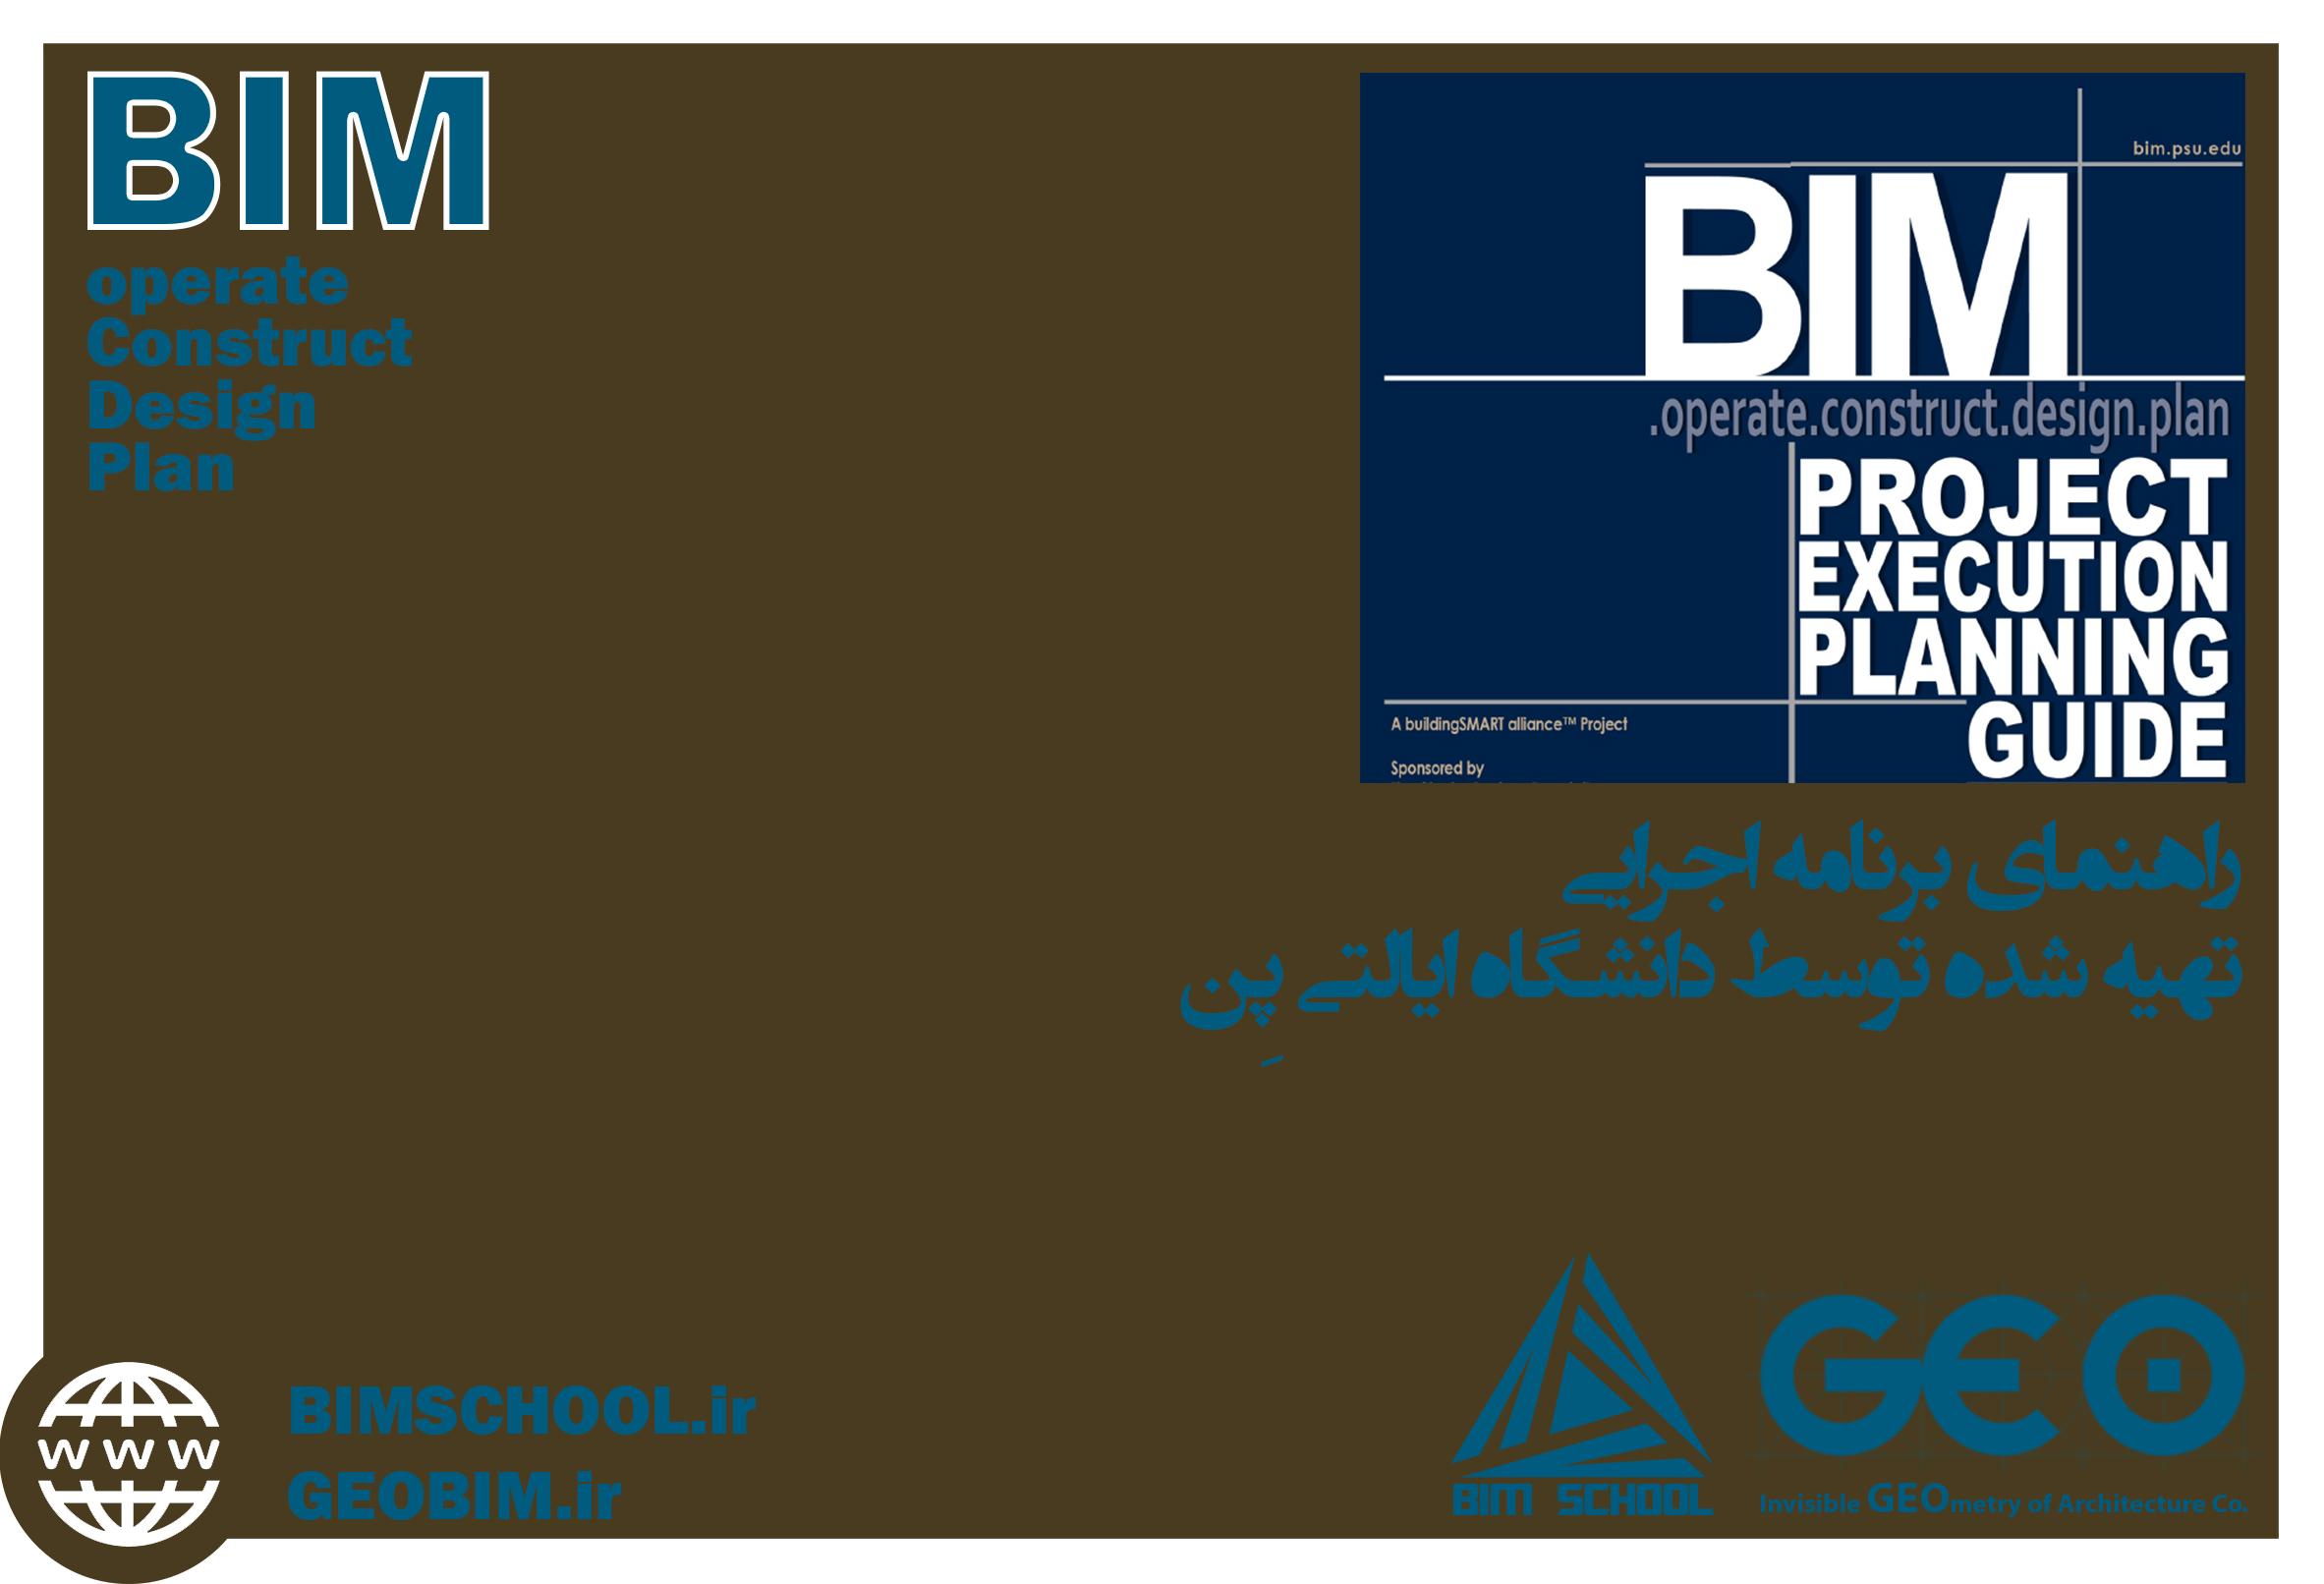 bim_pxp_bim_studio(WWW.BIMSCHOOL.ir-WWW.GEOBIM.ir)